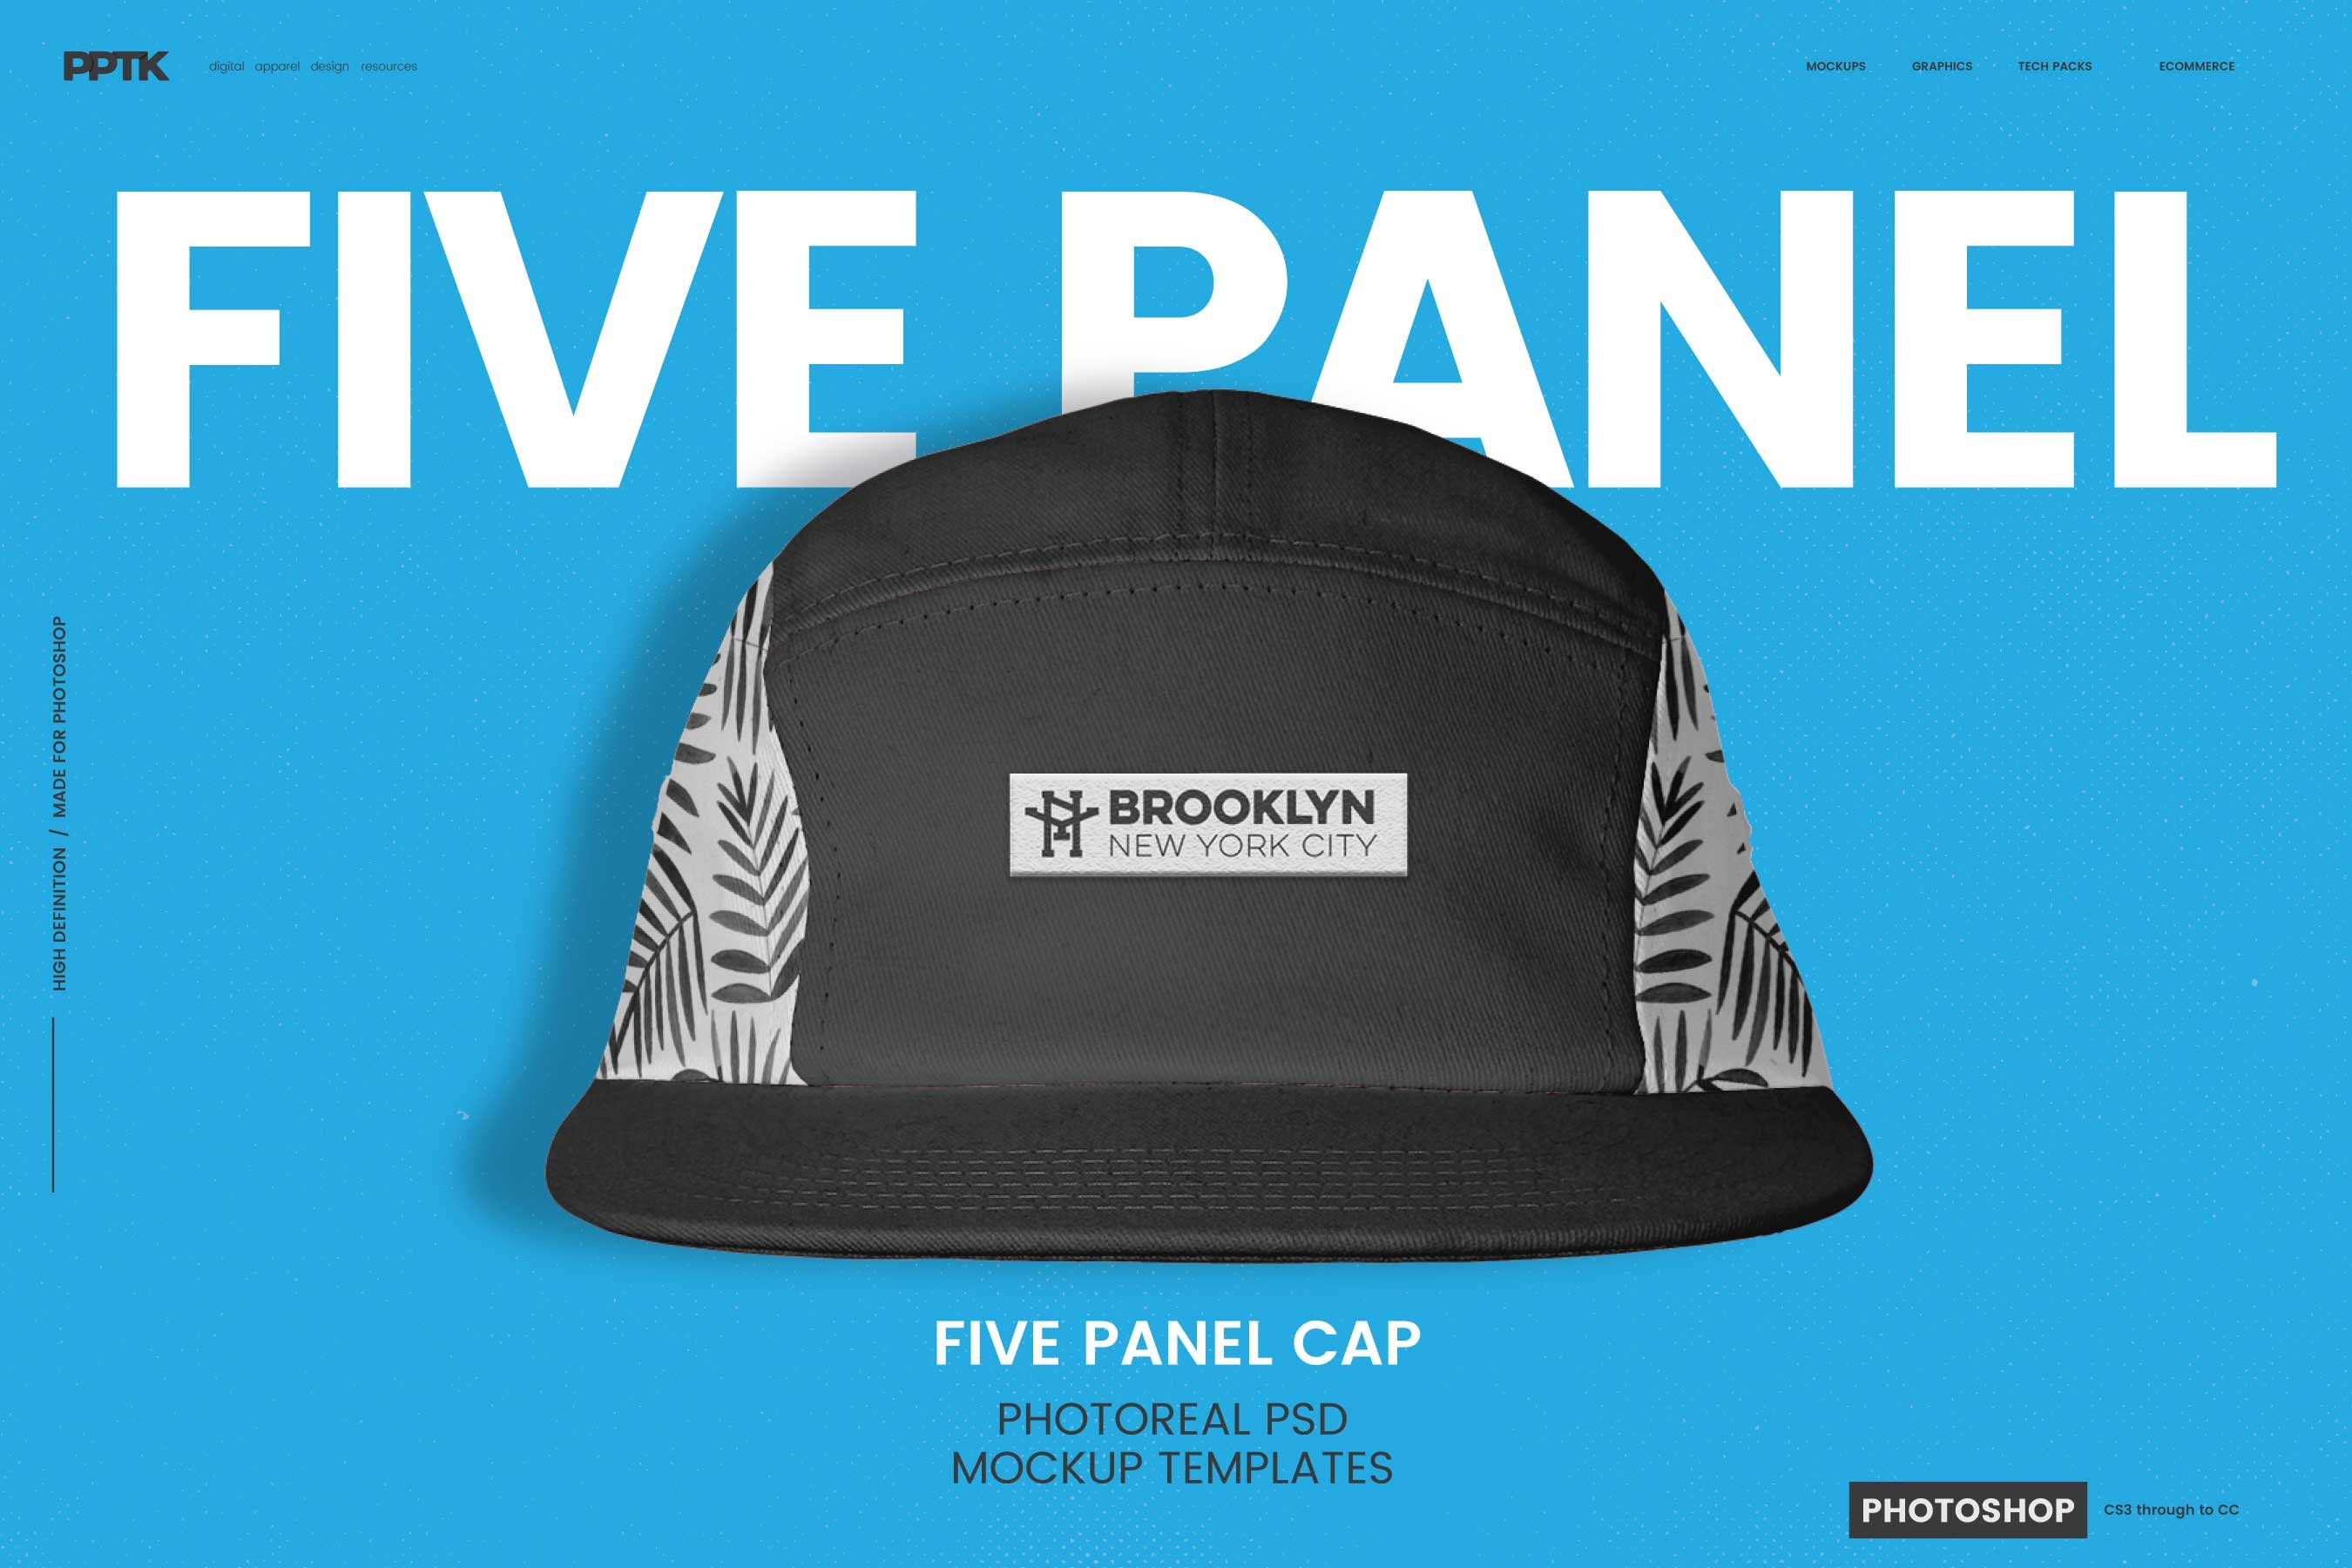 5 Panel Cap Photoshop Templates ~ Product Mockups ~ Creative Market